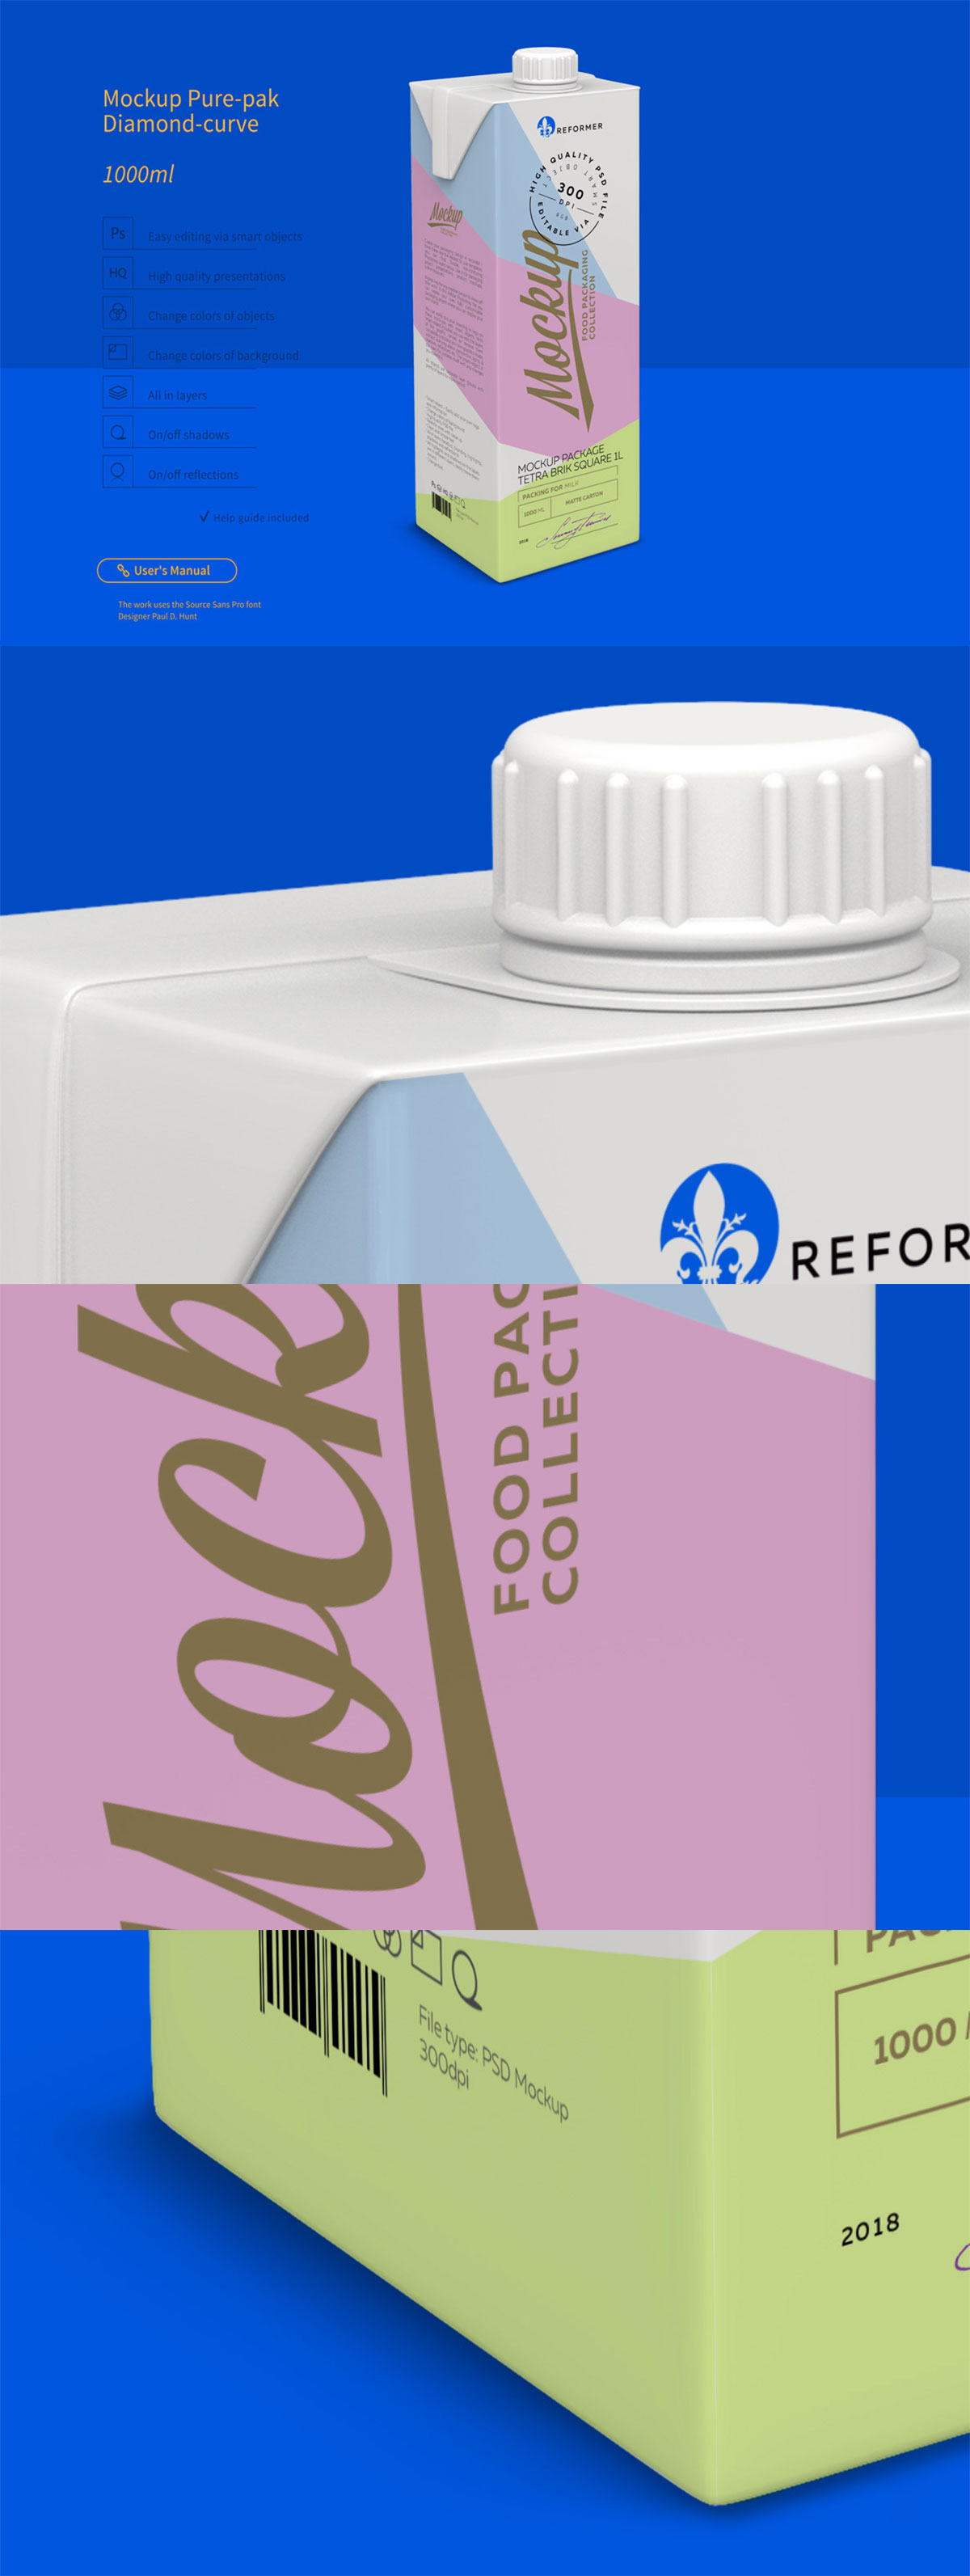 Free Tetra Brik Square Mockup Package 1L